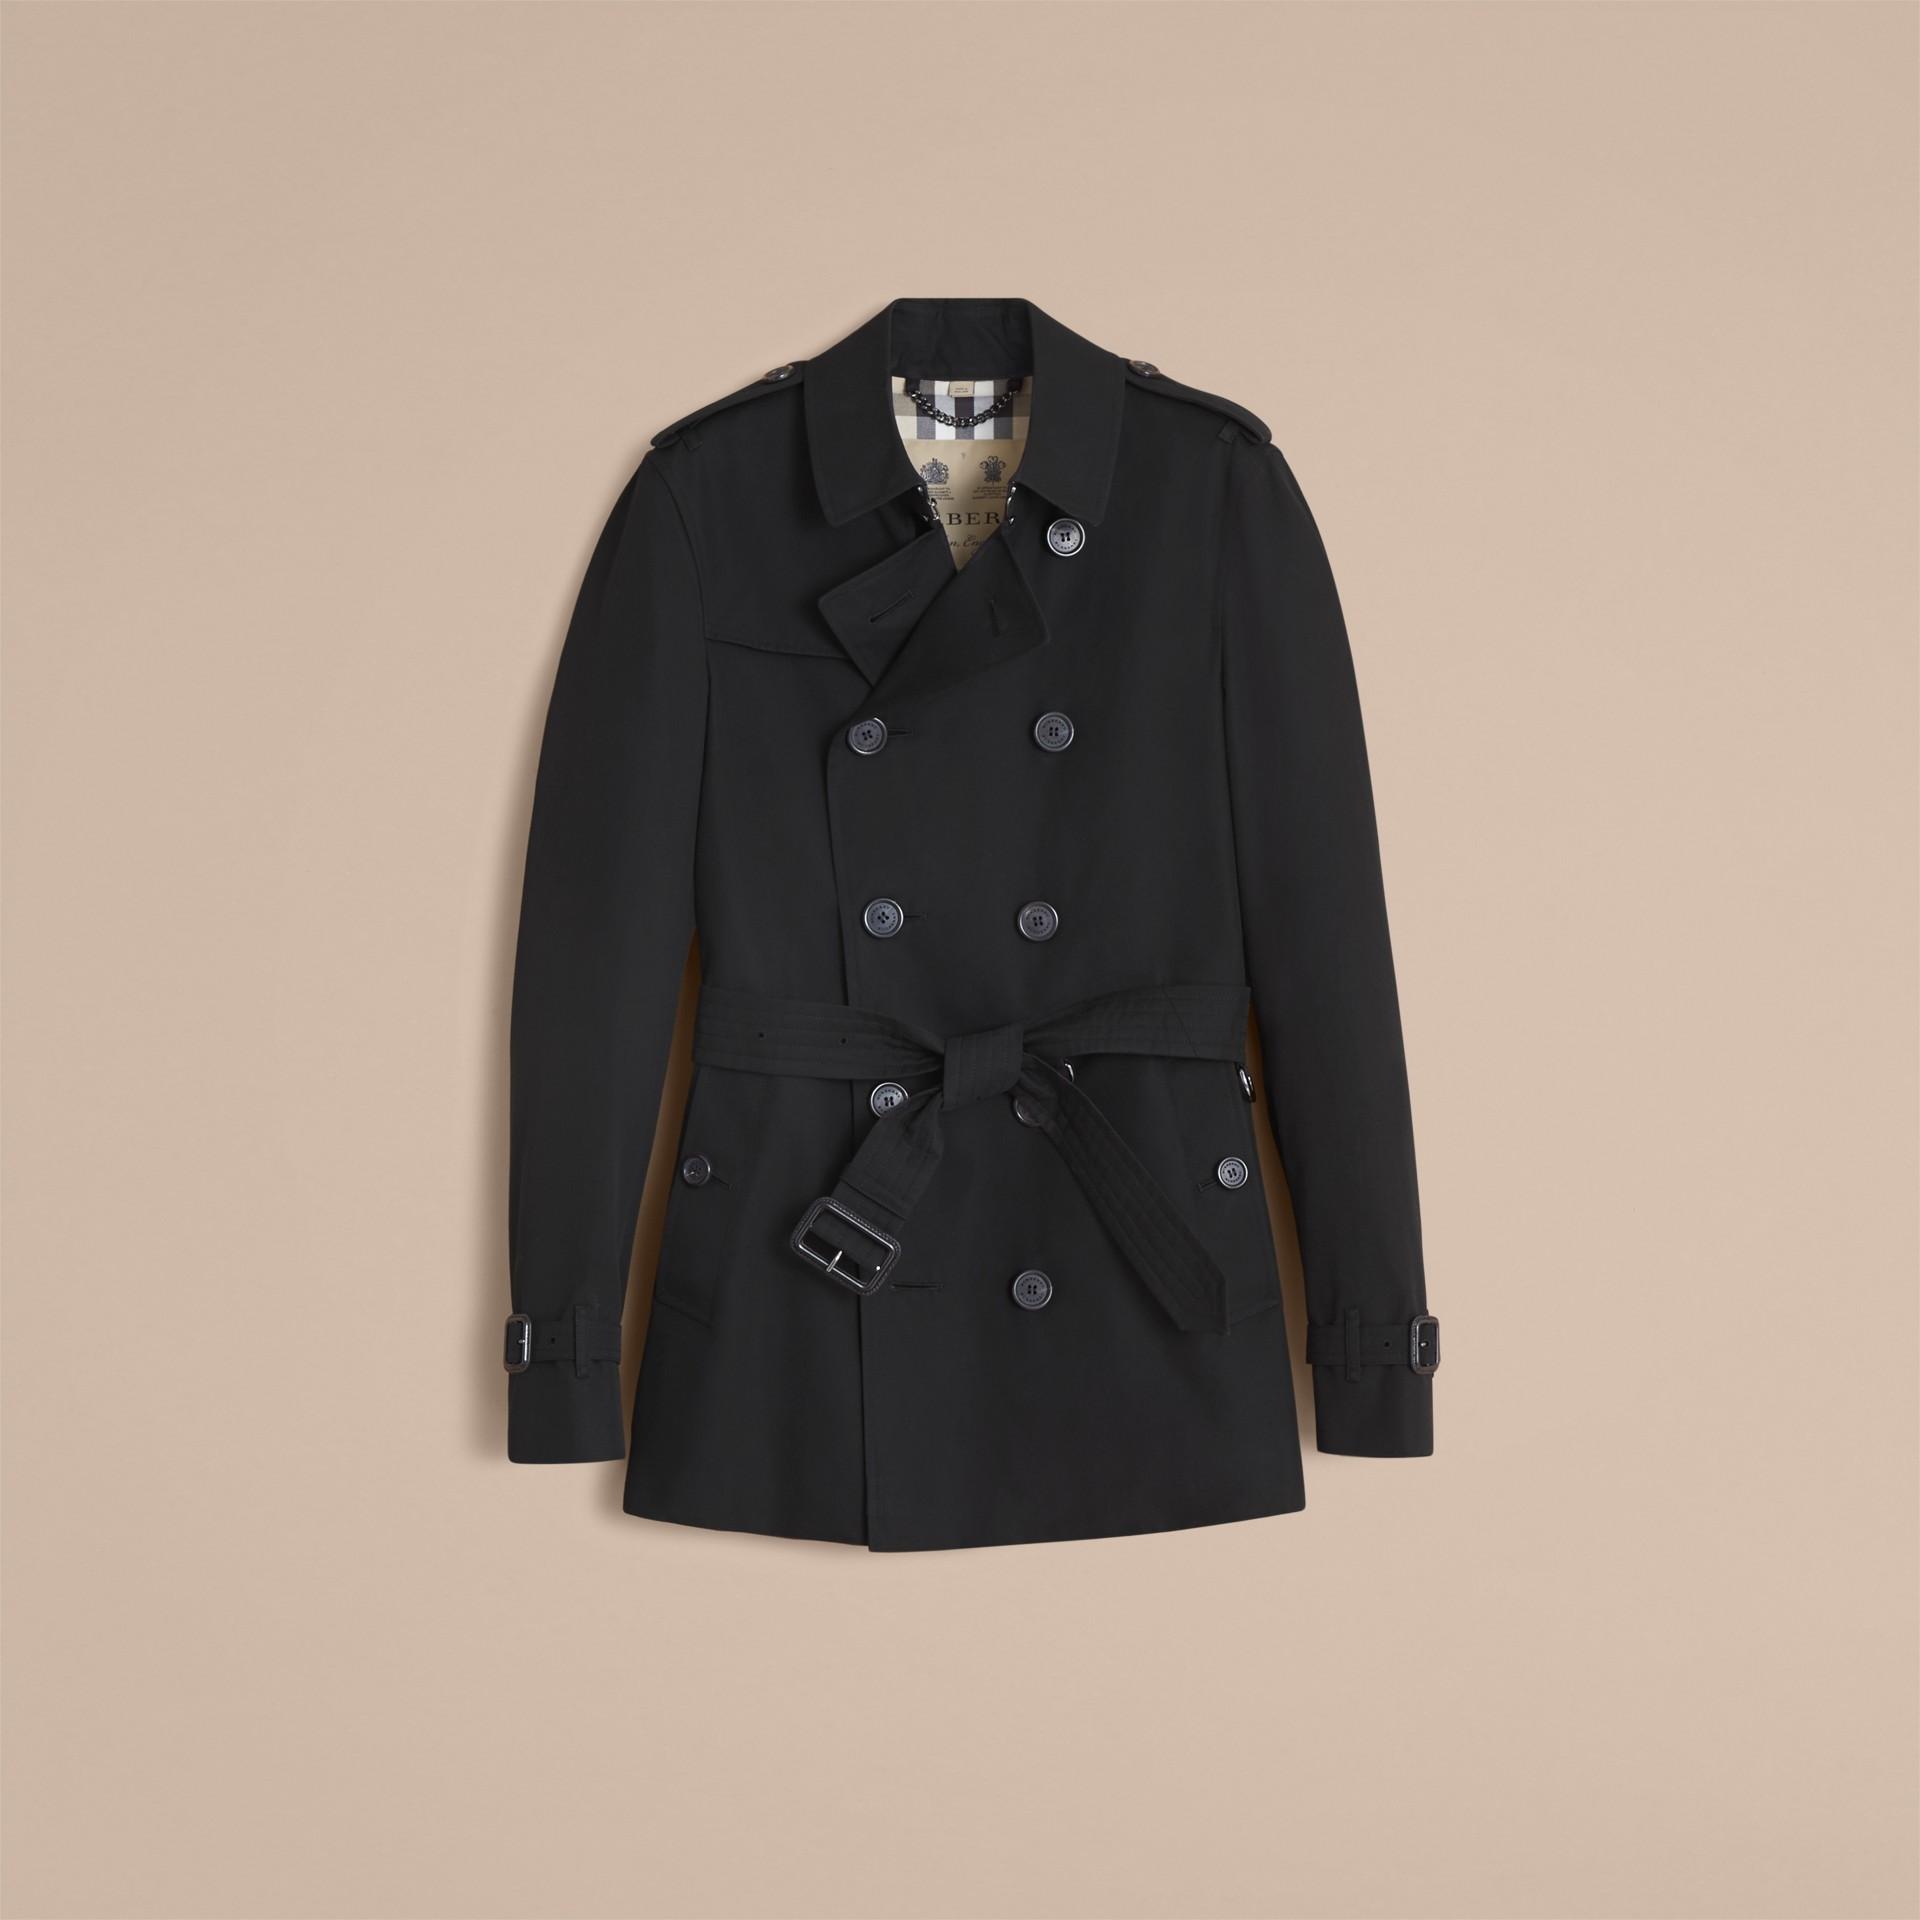 Negro Trench coat Chelsea – Trench coat Heritage corto Negro - imagen de la galería 5